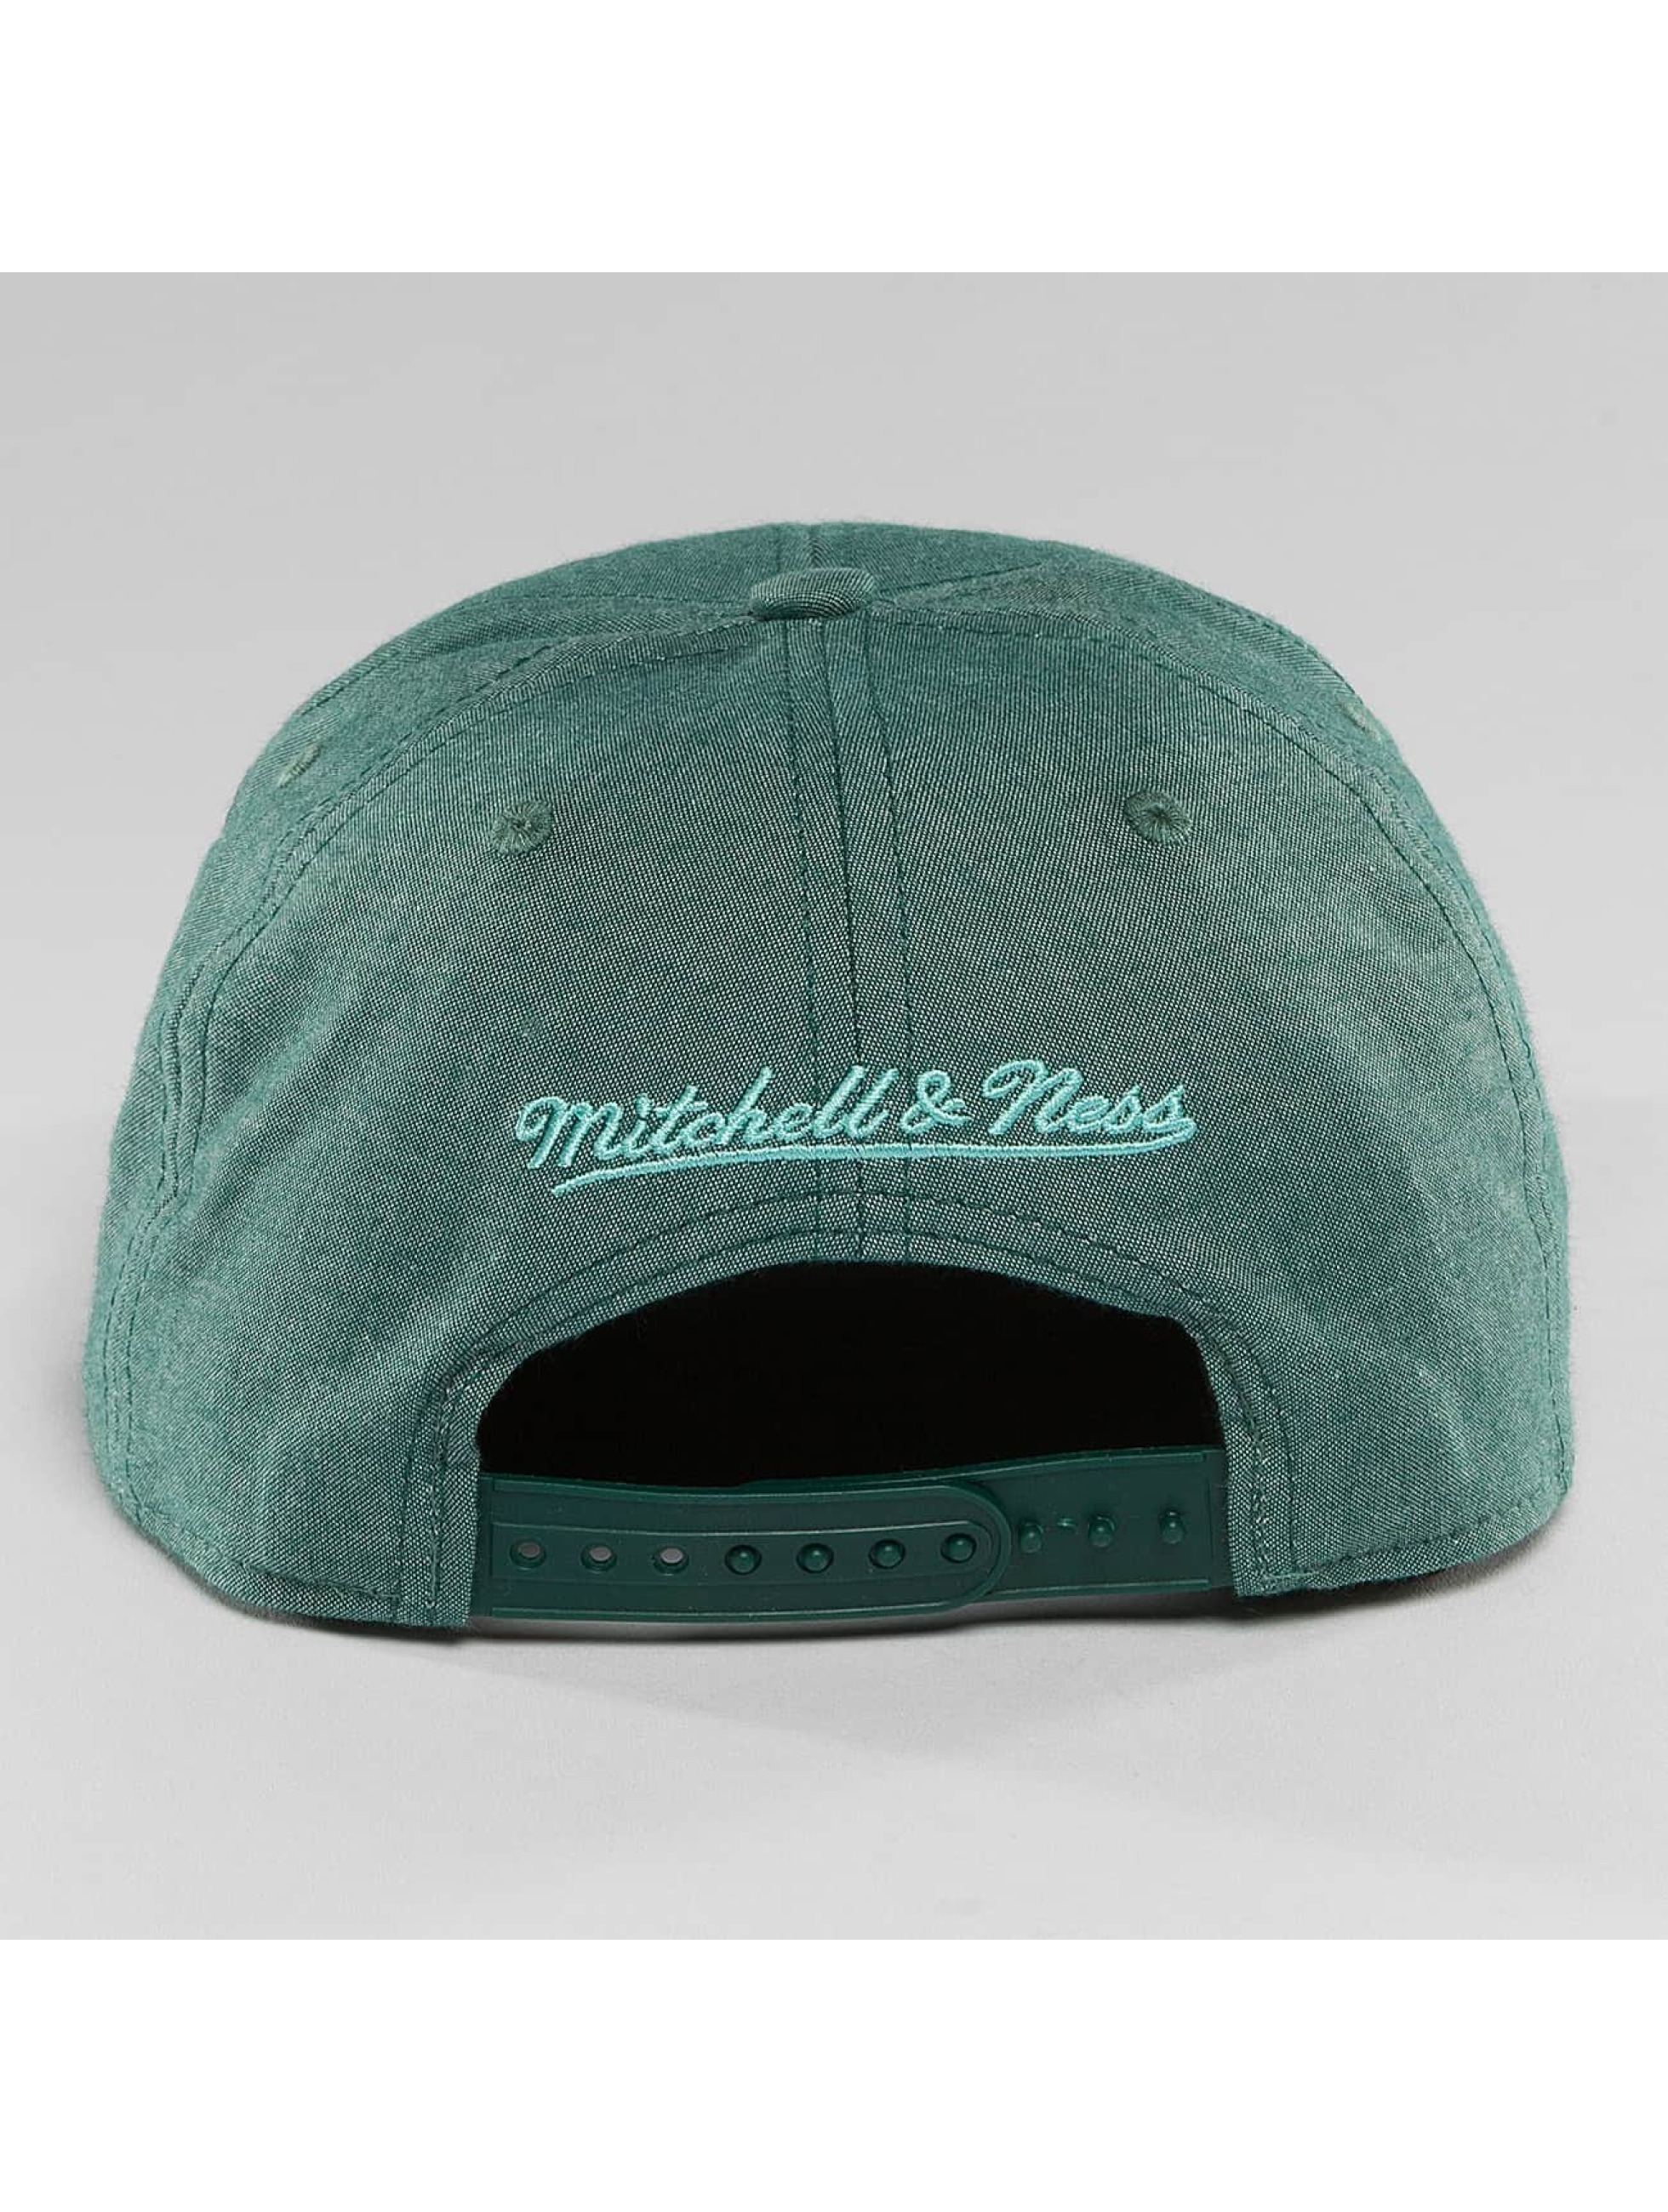 Mitchell & Ness Gorra Snapback Italian Washed oliva